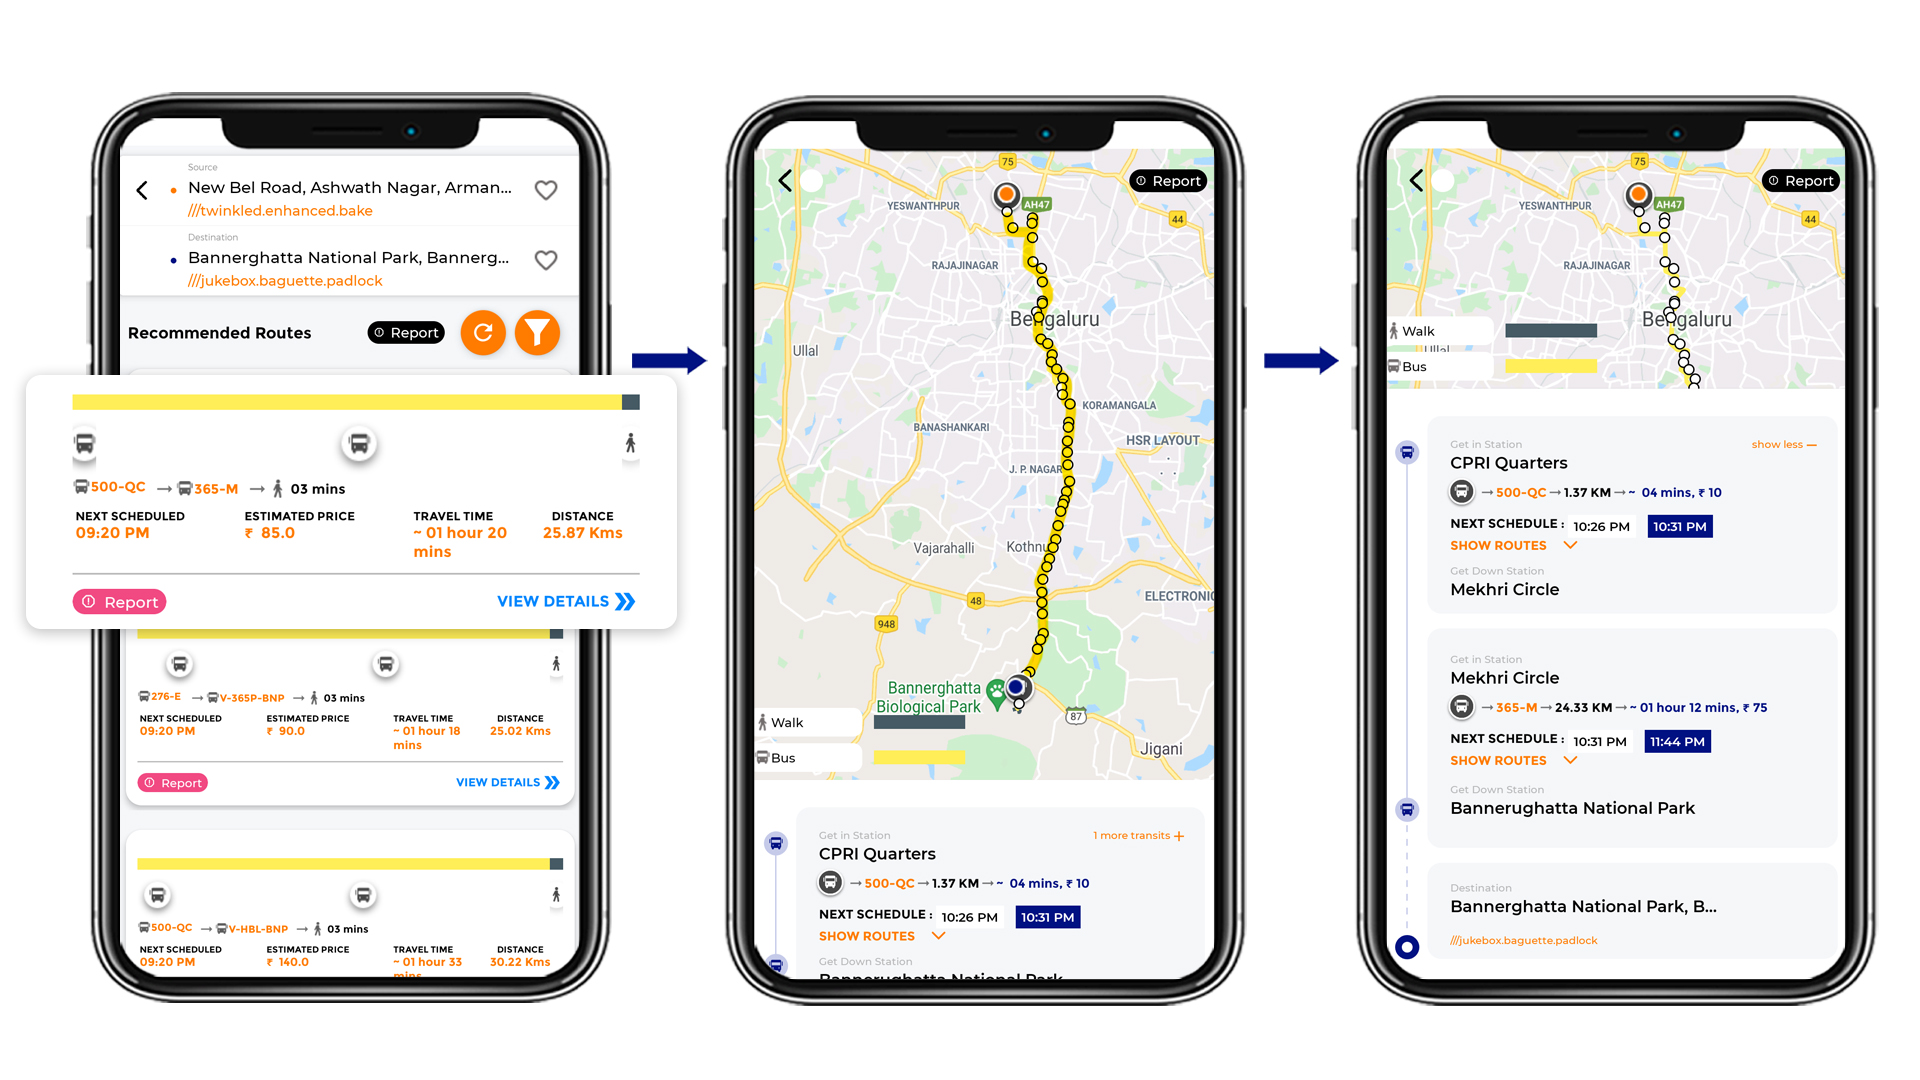 Tummoc, Tummoc app, Bannerghatta National Park, Public transport information, New BEL road